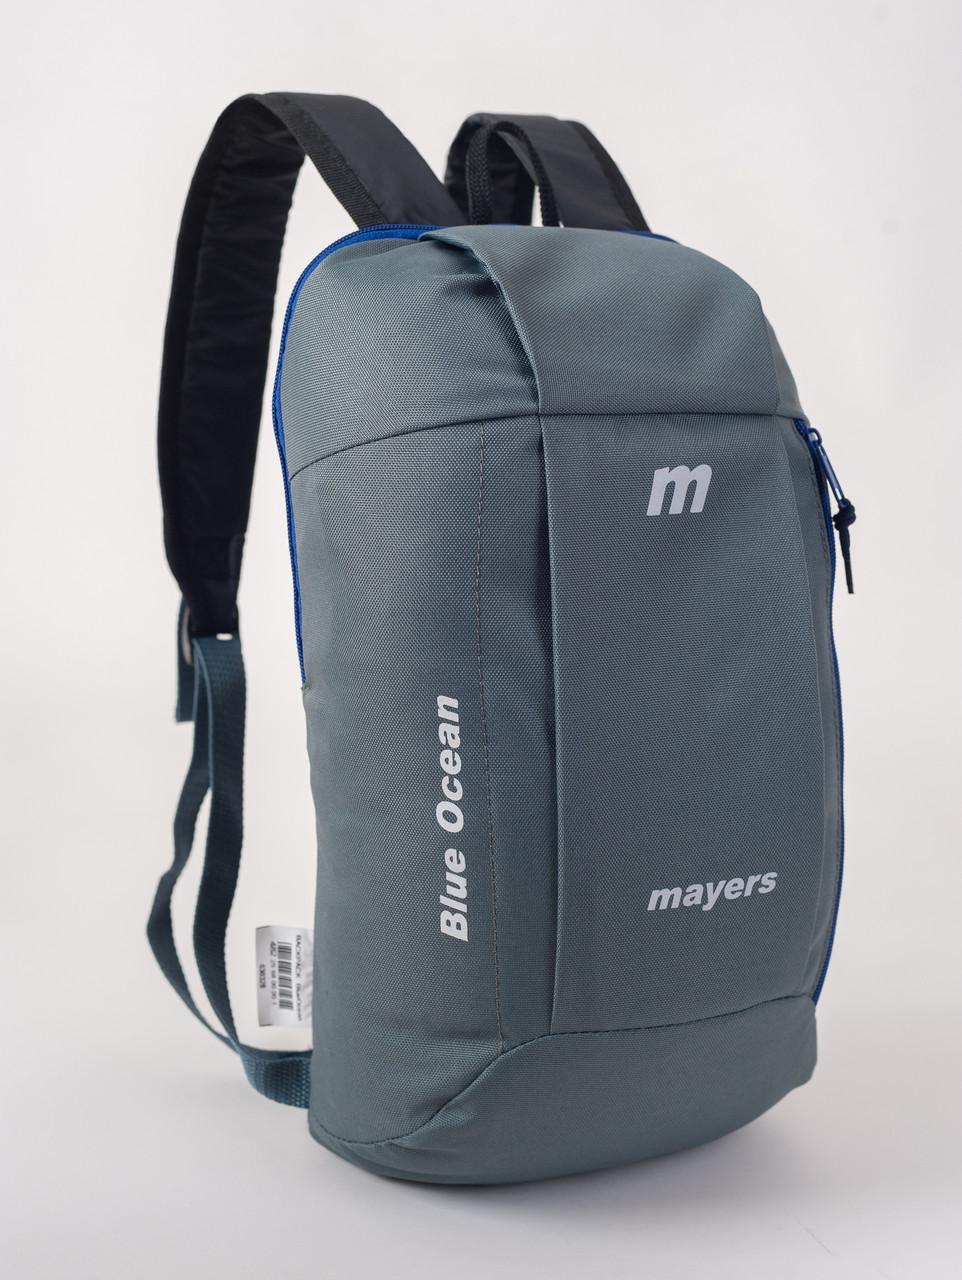 Спортивный рюкзак MAYERS 10L, серый / синяя молния, фото 2